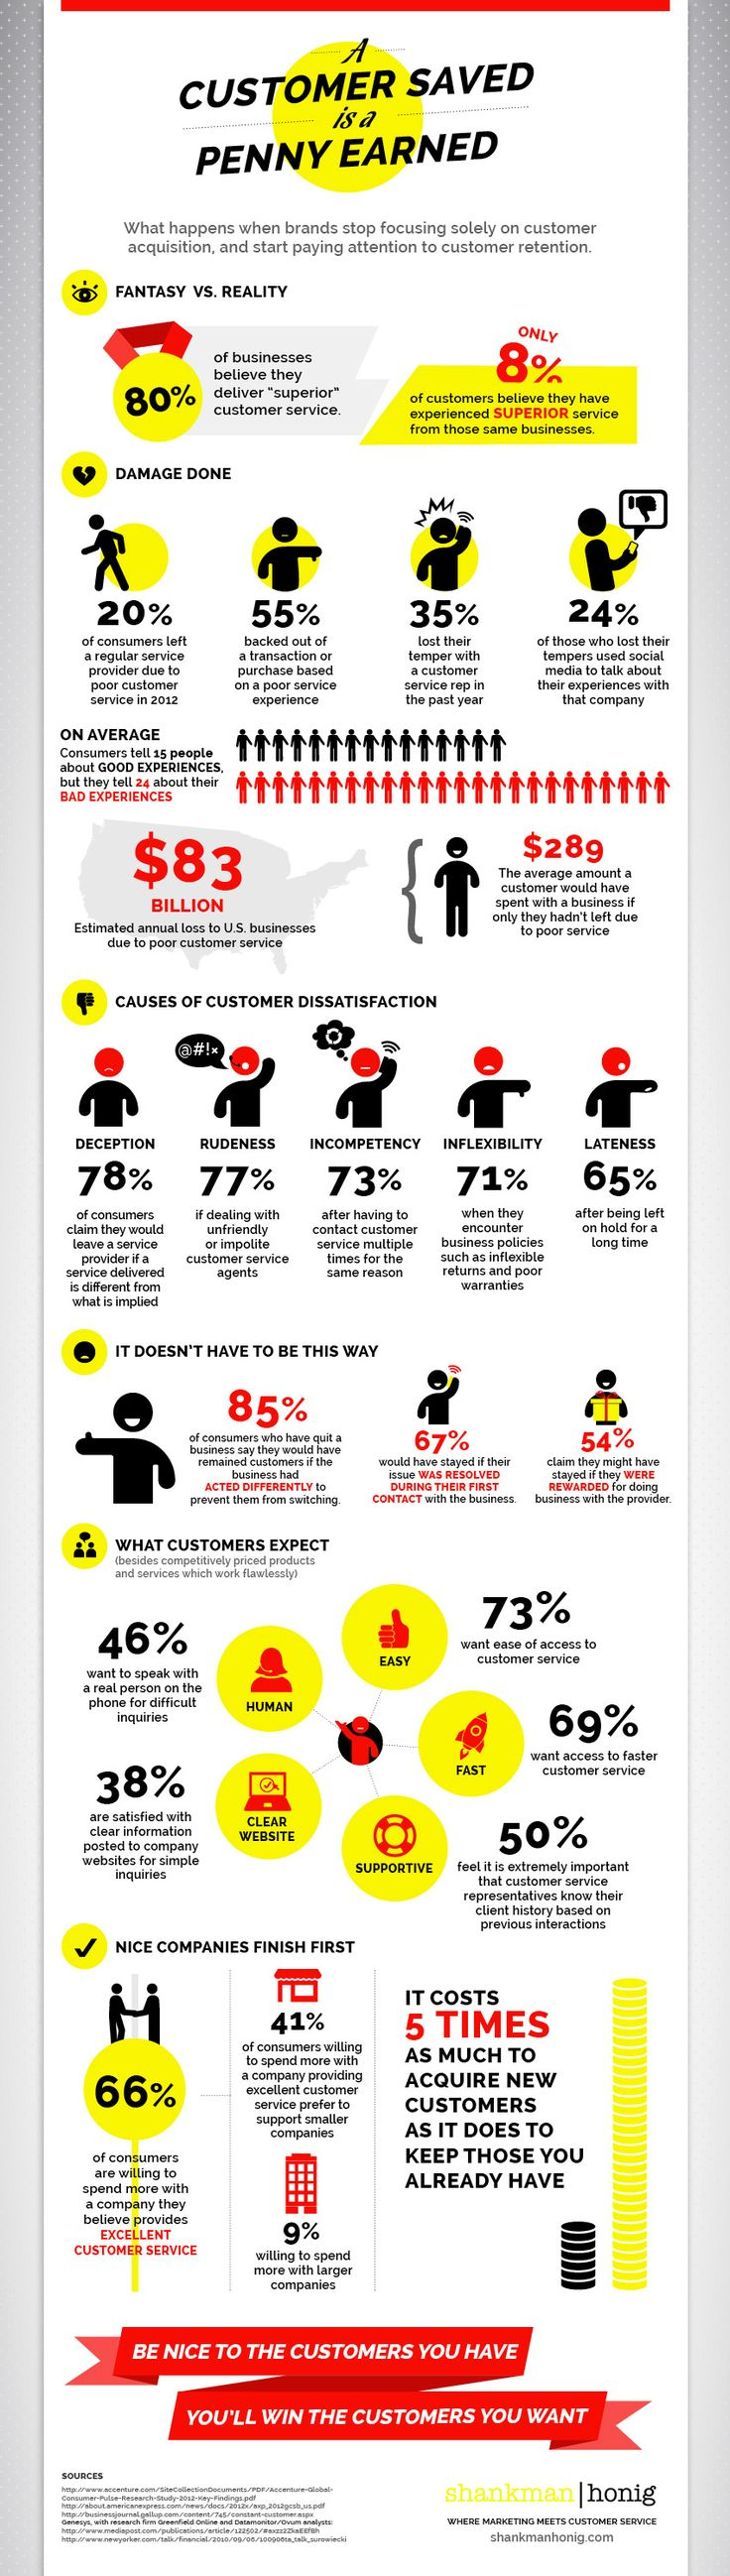 Stop Losing Money and Focus on Customer Service #Infographic #success www.socialmediamamma.com